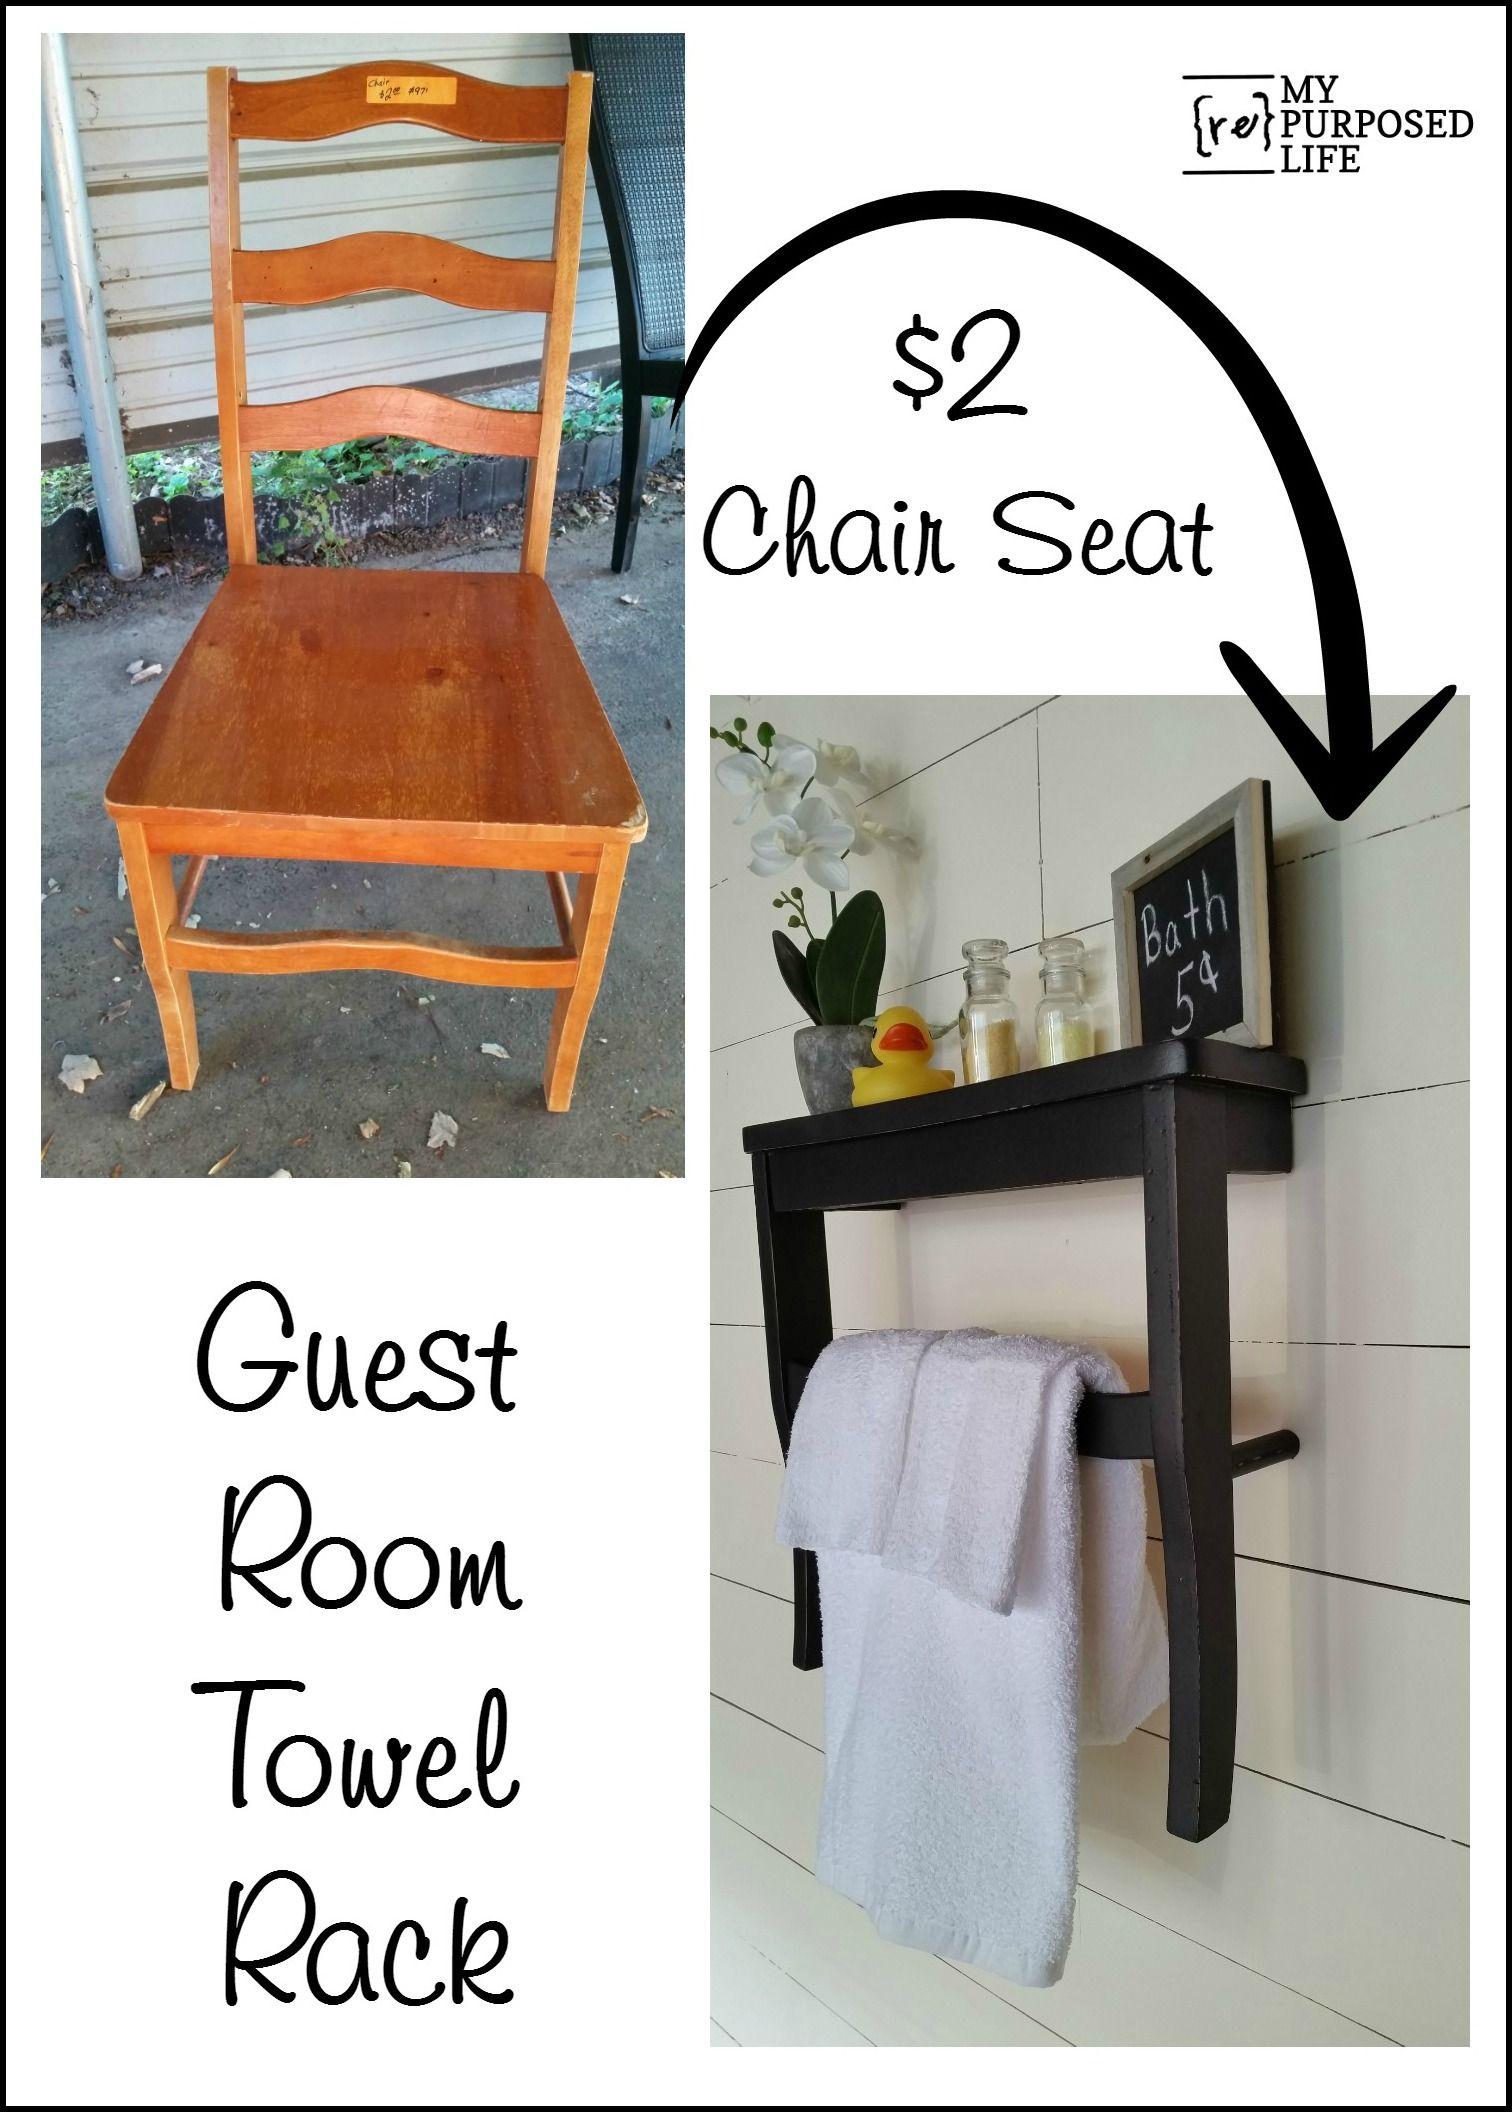 chair seat wall shelf rack shelf towels and shelves. Black Bedroom Furniture Sets. Home Design Ideas